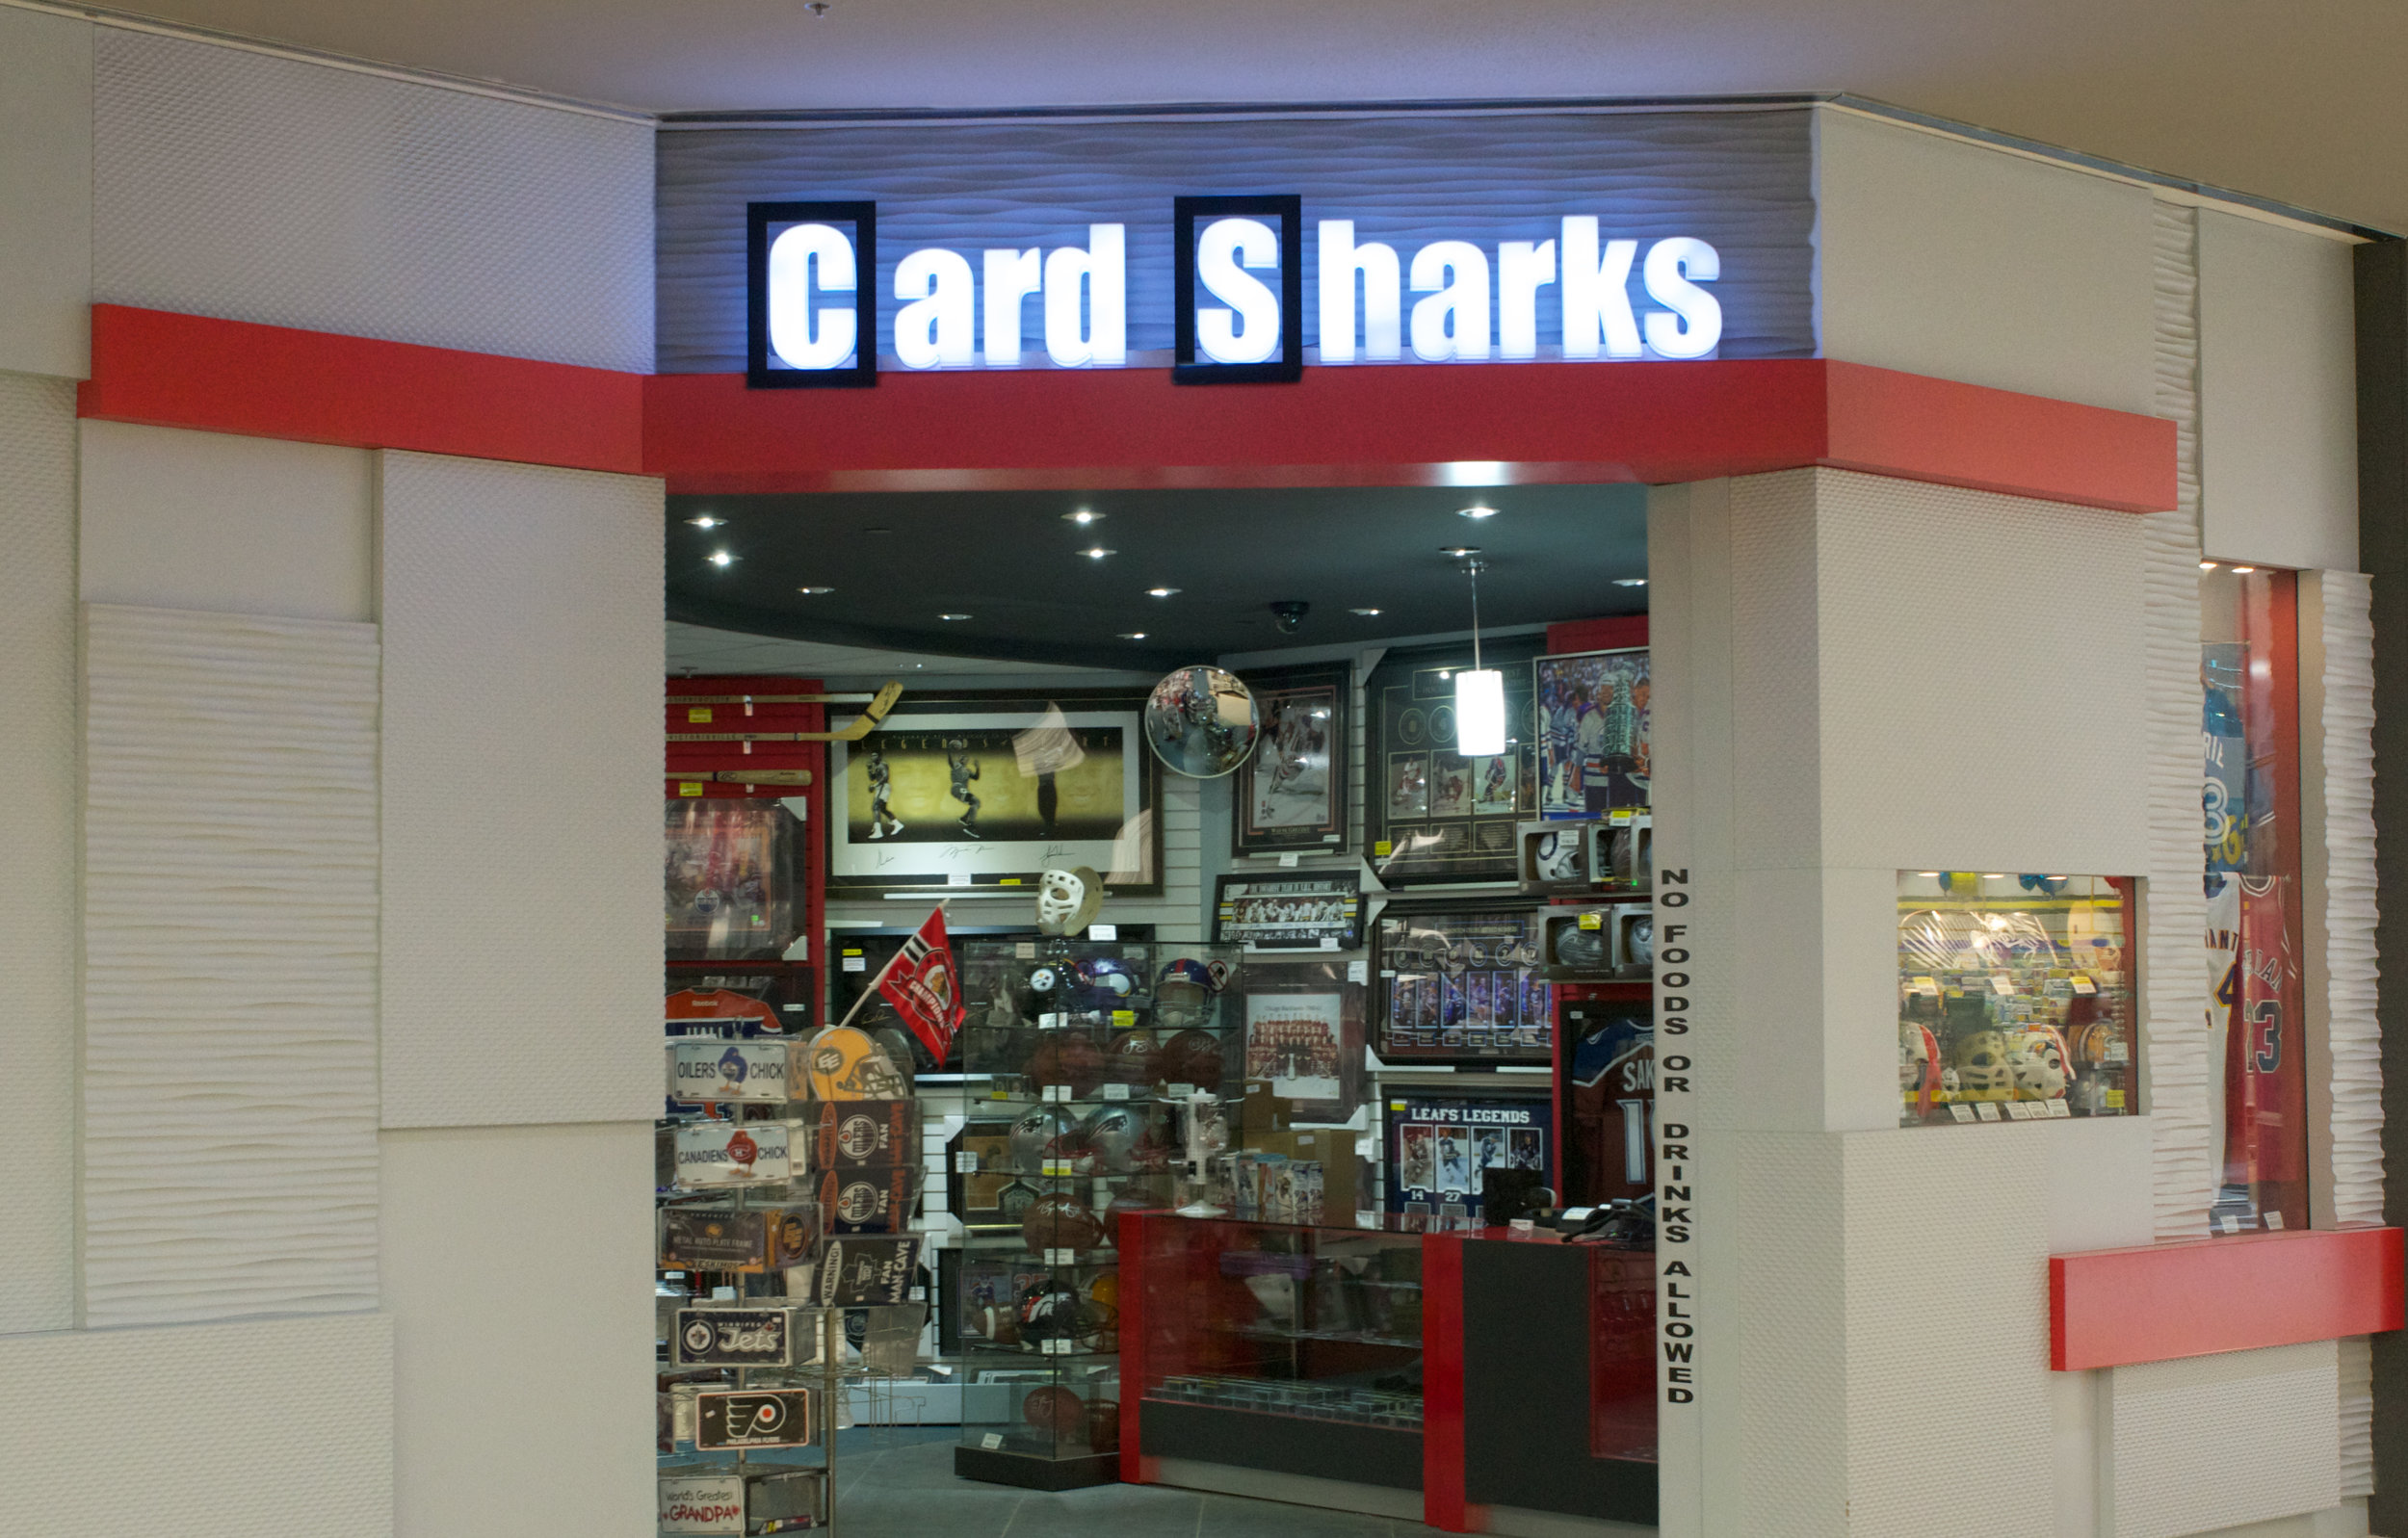 CardSharks - 1 sign.jpg